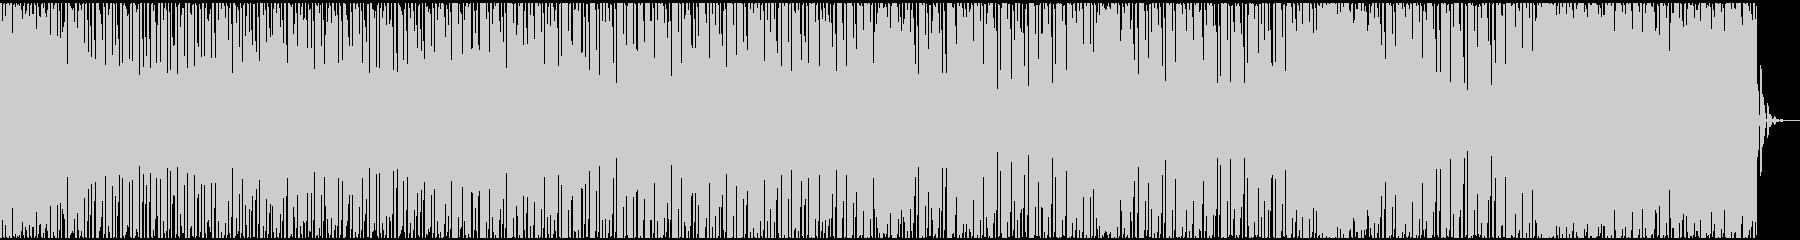 【EDM】トランス、ロング4の未再生の波形